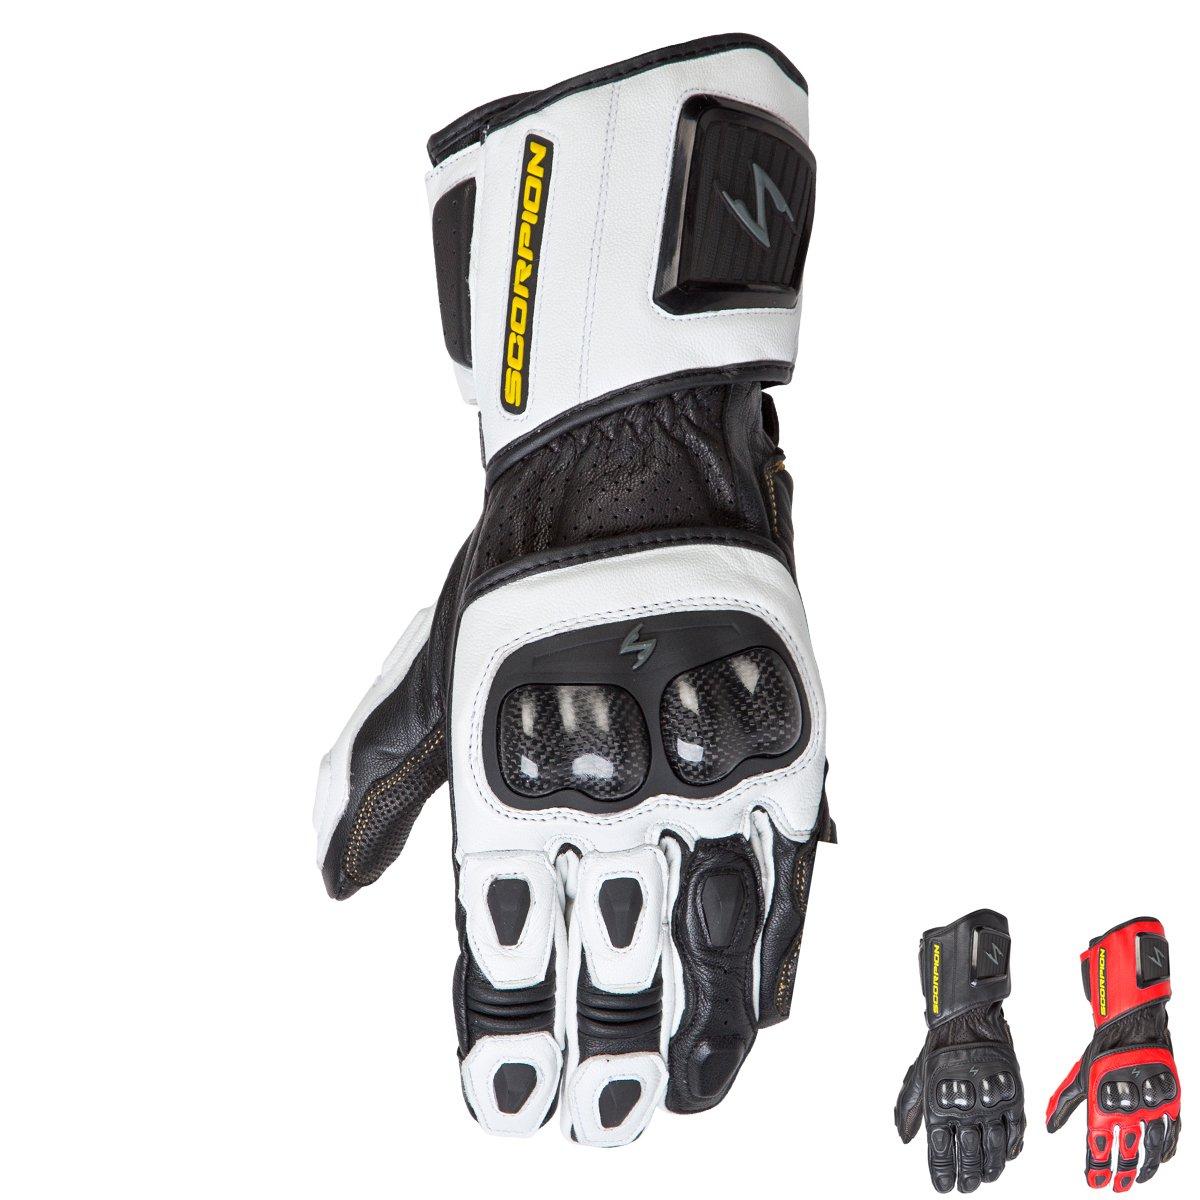 ScorpionExo SG3 MKII Men's Long Gauntlet Sport Gloves (White, X-Large) by Scorpion (Image #1)